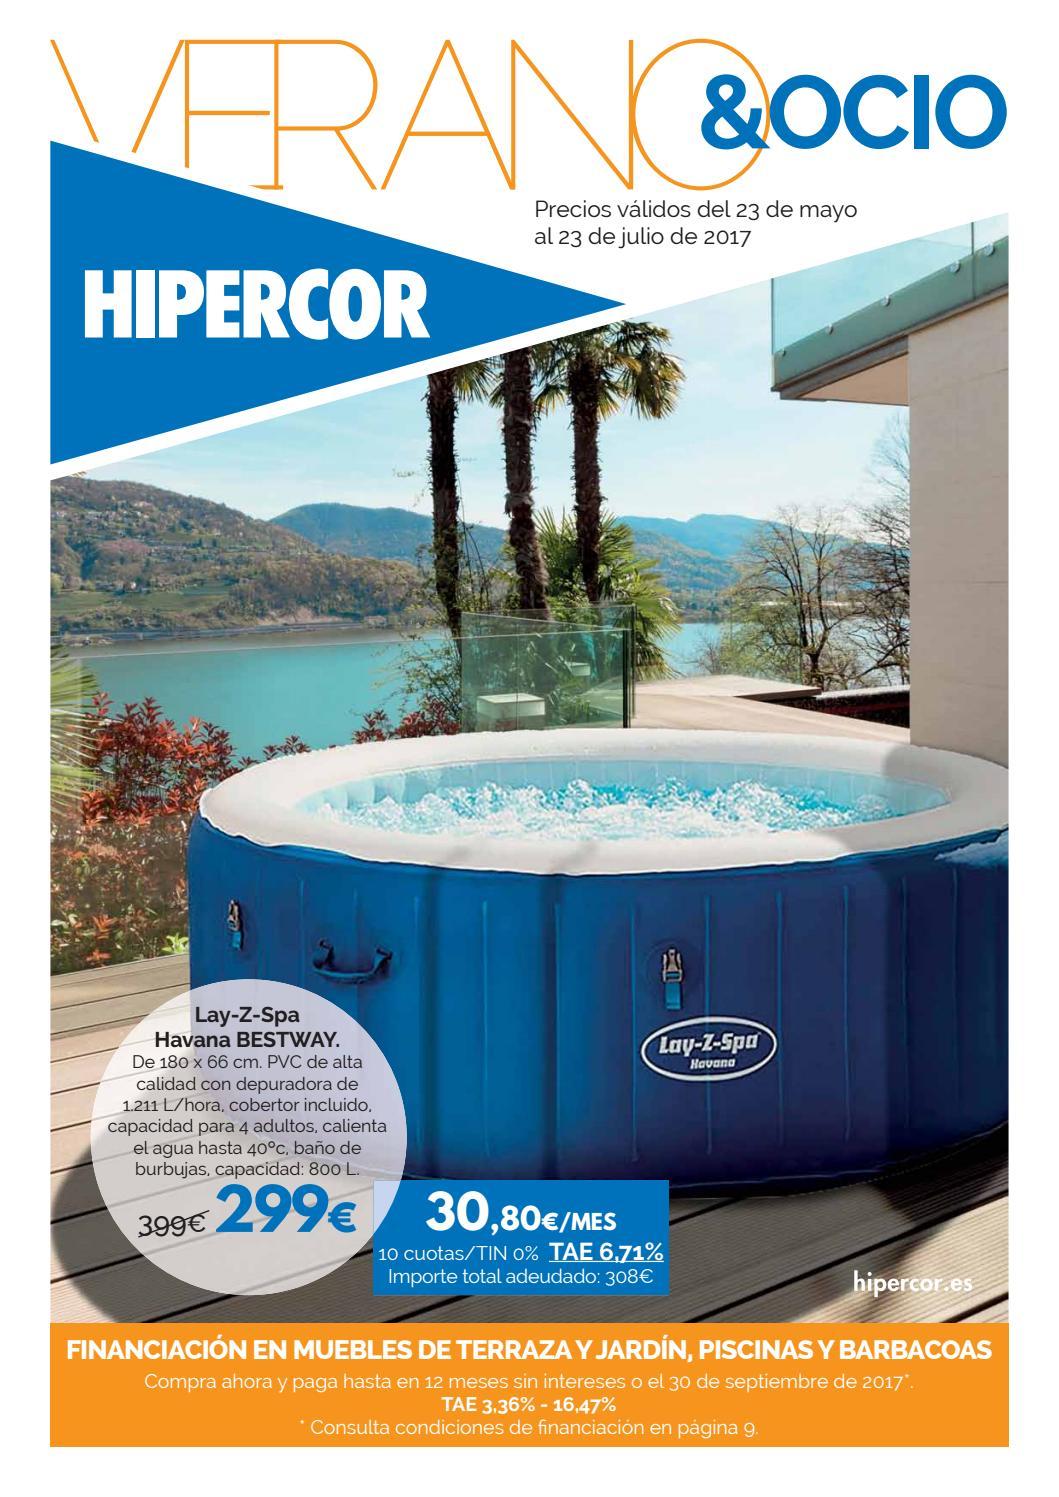 Piscinas hipercor by Ofertas Supermercados - issuu 5493fa6ddd17